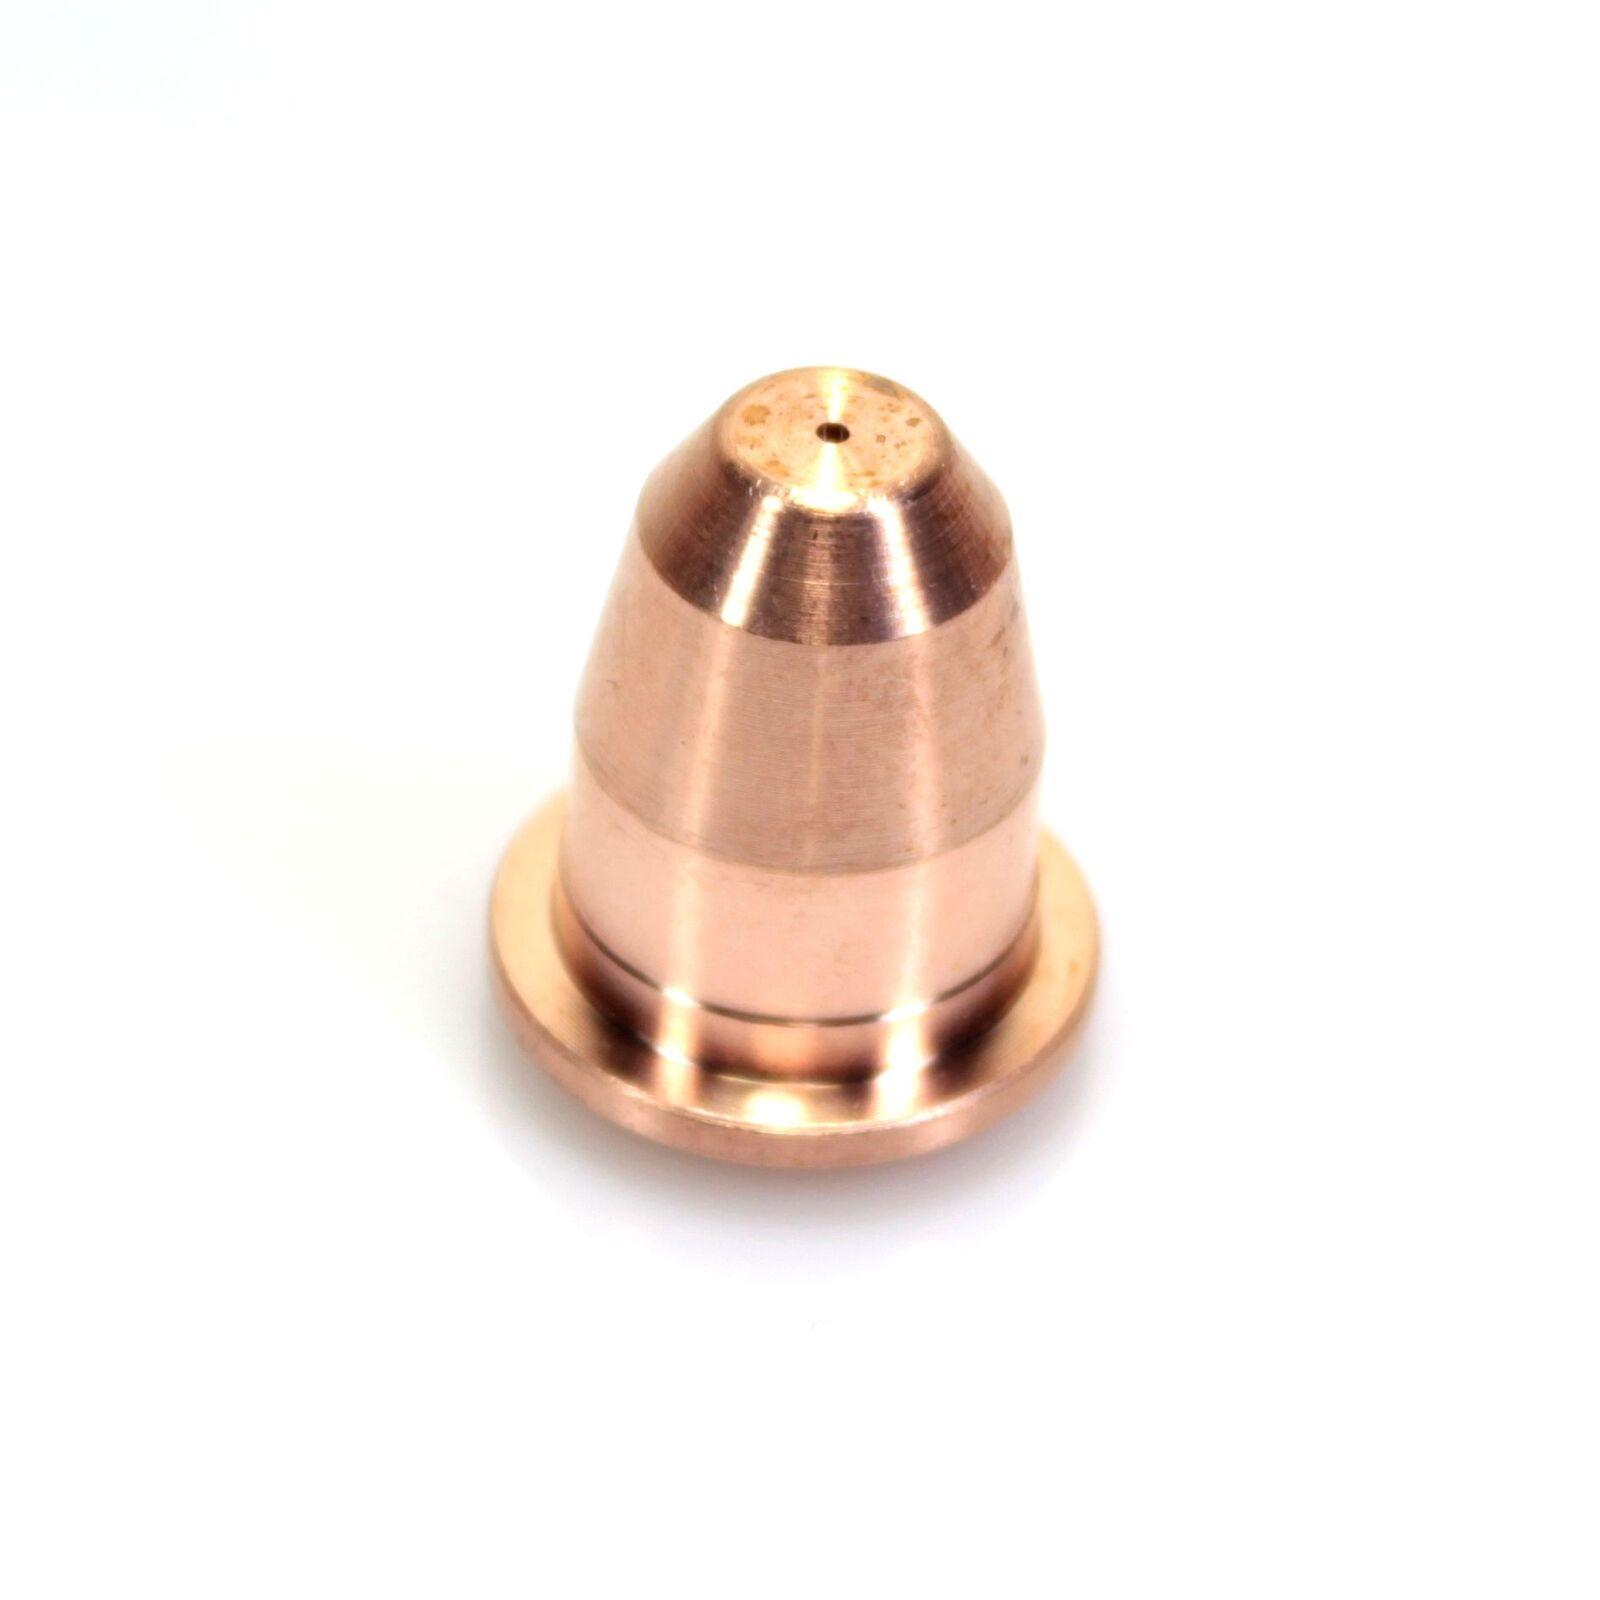 RWPD-0116-8 Plasma Cutting Torch Tips Nozzle for Razorweld TRF45-6-CC1 Qty-10